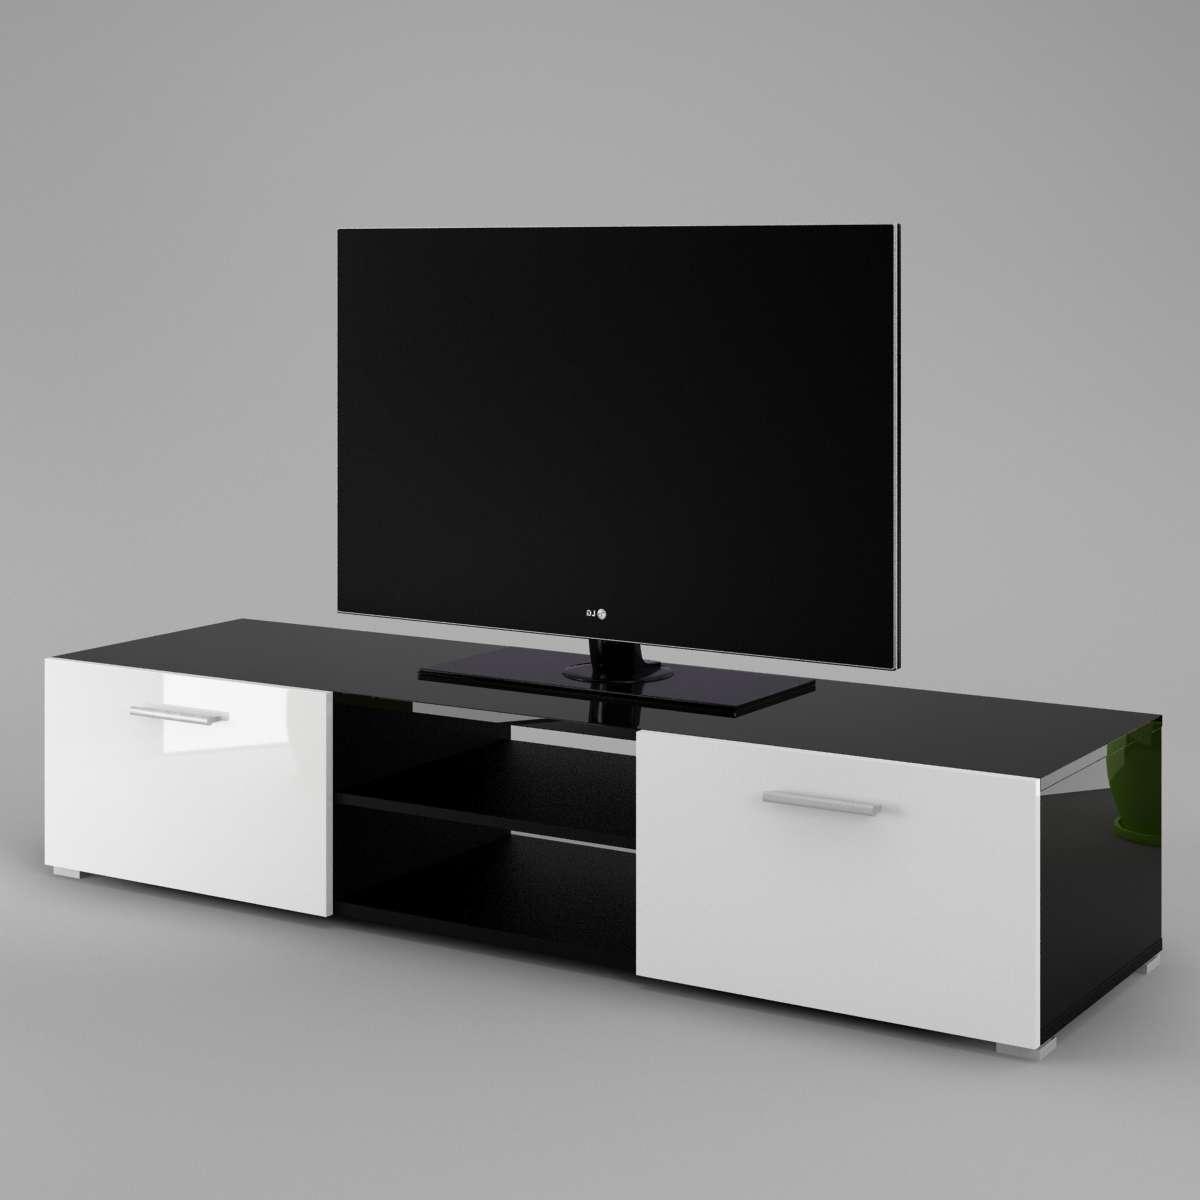 Tv Cabinet Luna – Labi Furniturelabi Furniture For High Gloss Tv Cabinets (View 17 of 20)